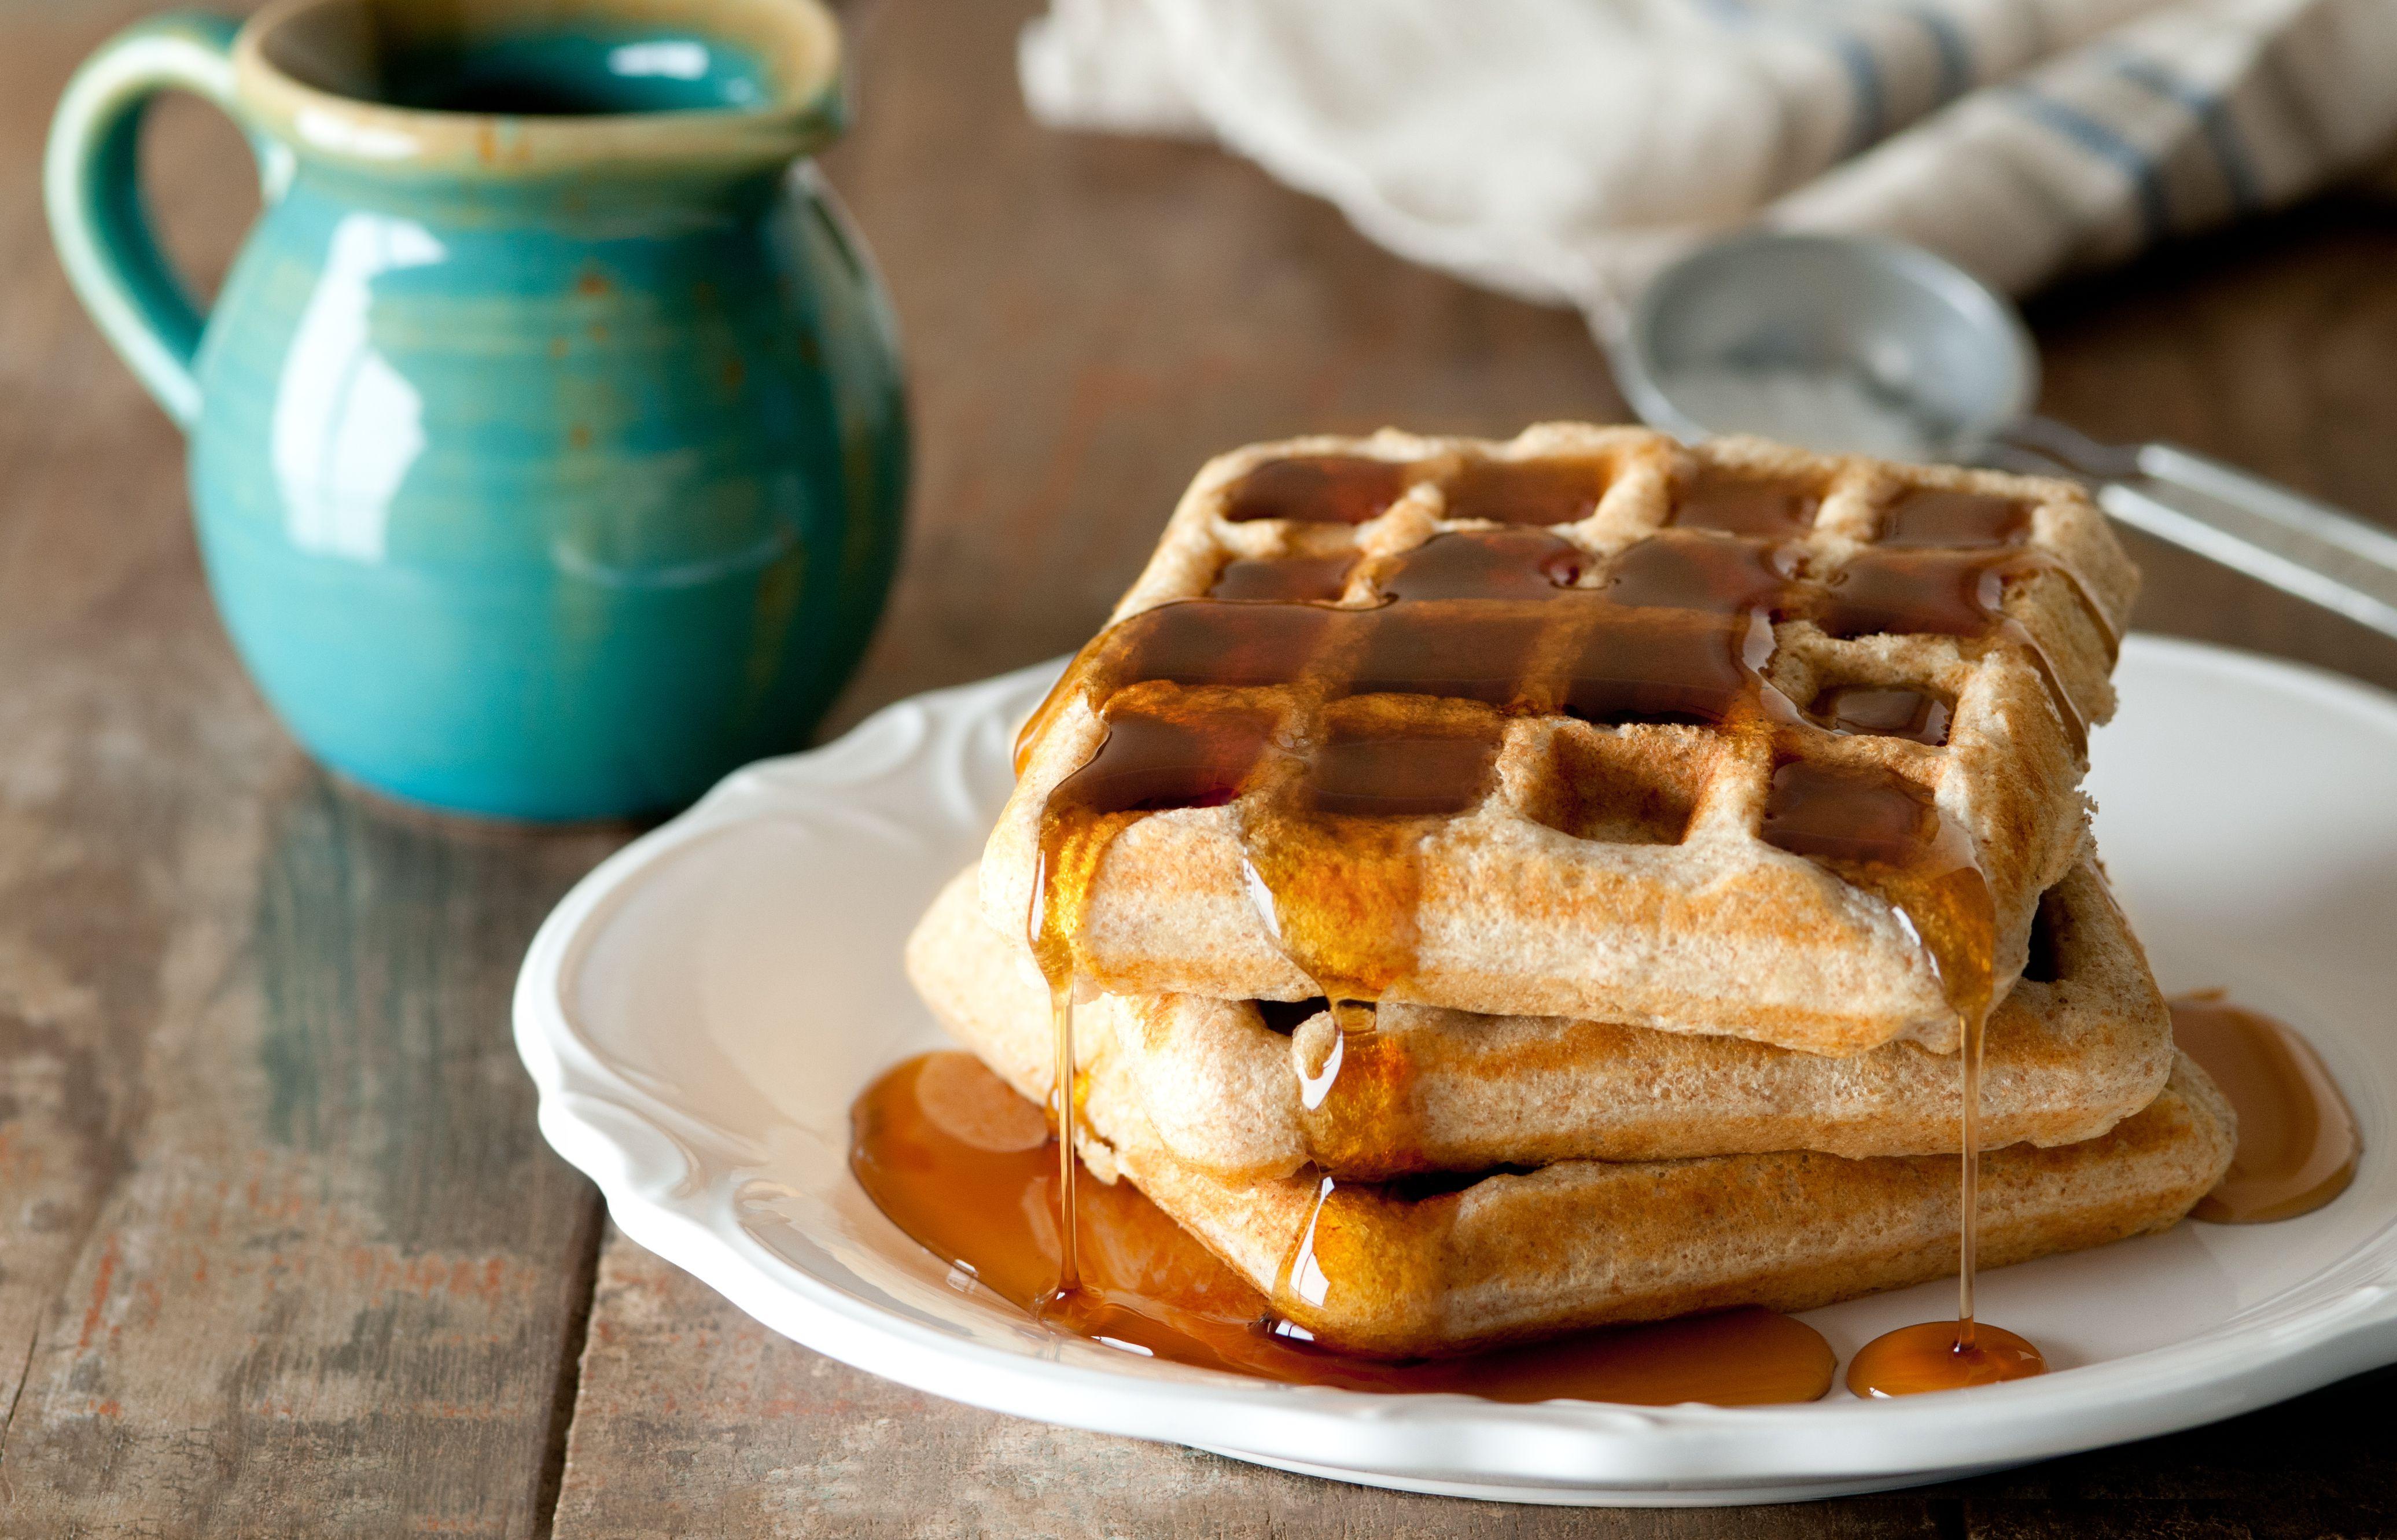 Low Fat Whole Wheat Vegan Waffles Recipe